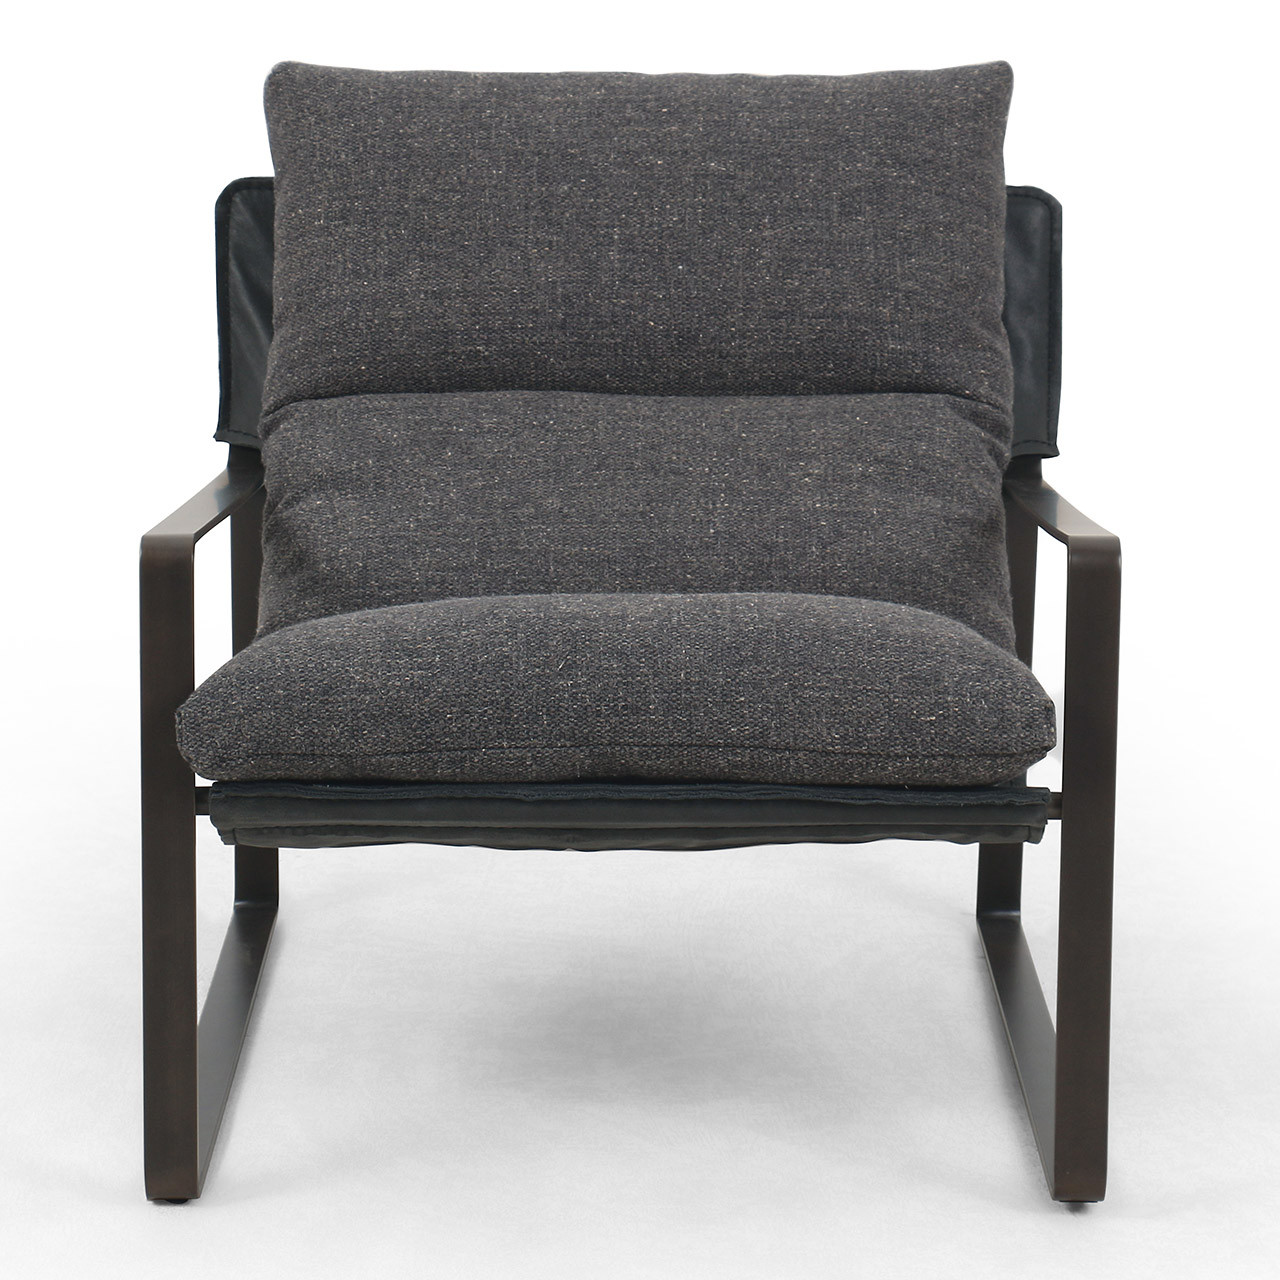 Elijah Sling Back Lounge Chair